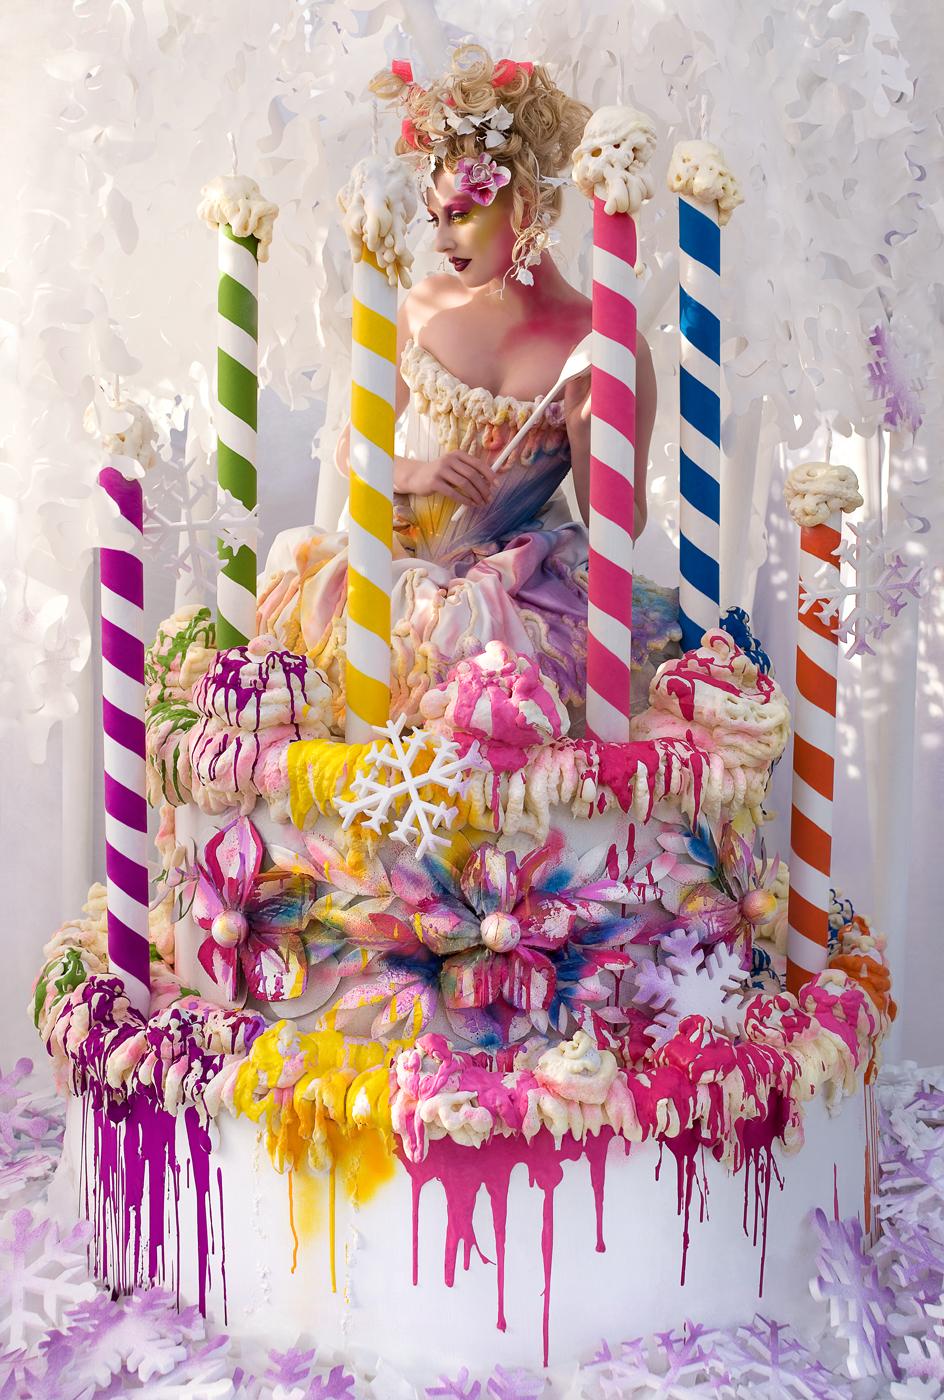 The Fairycake Godmother